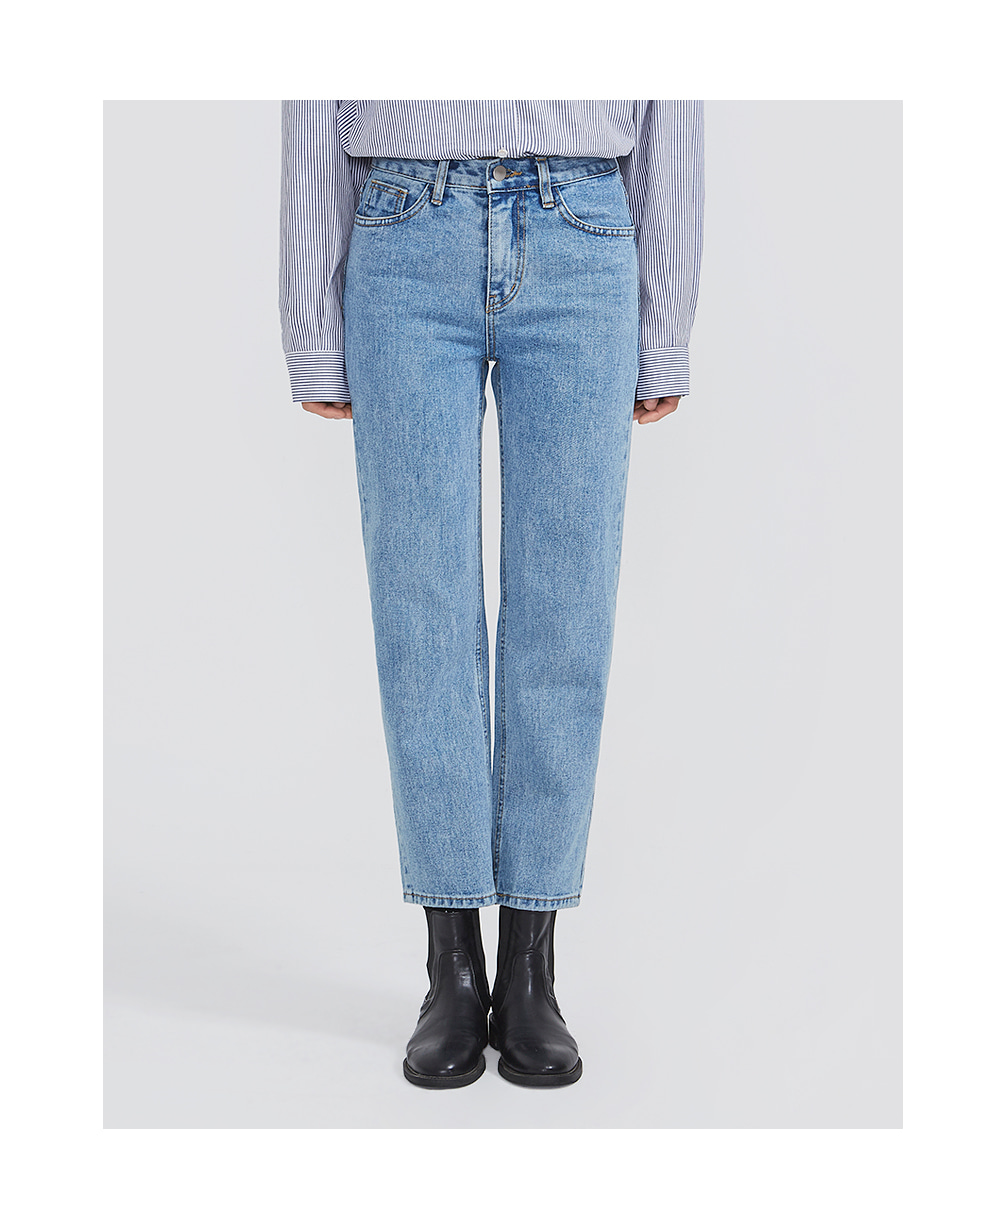 duly straight denim pants (s, m, l)